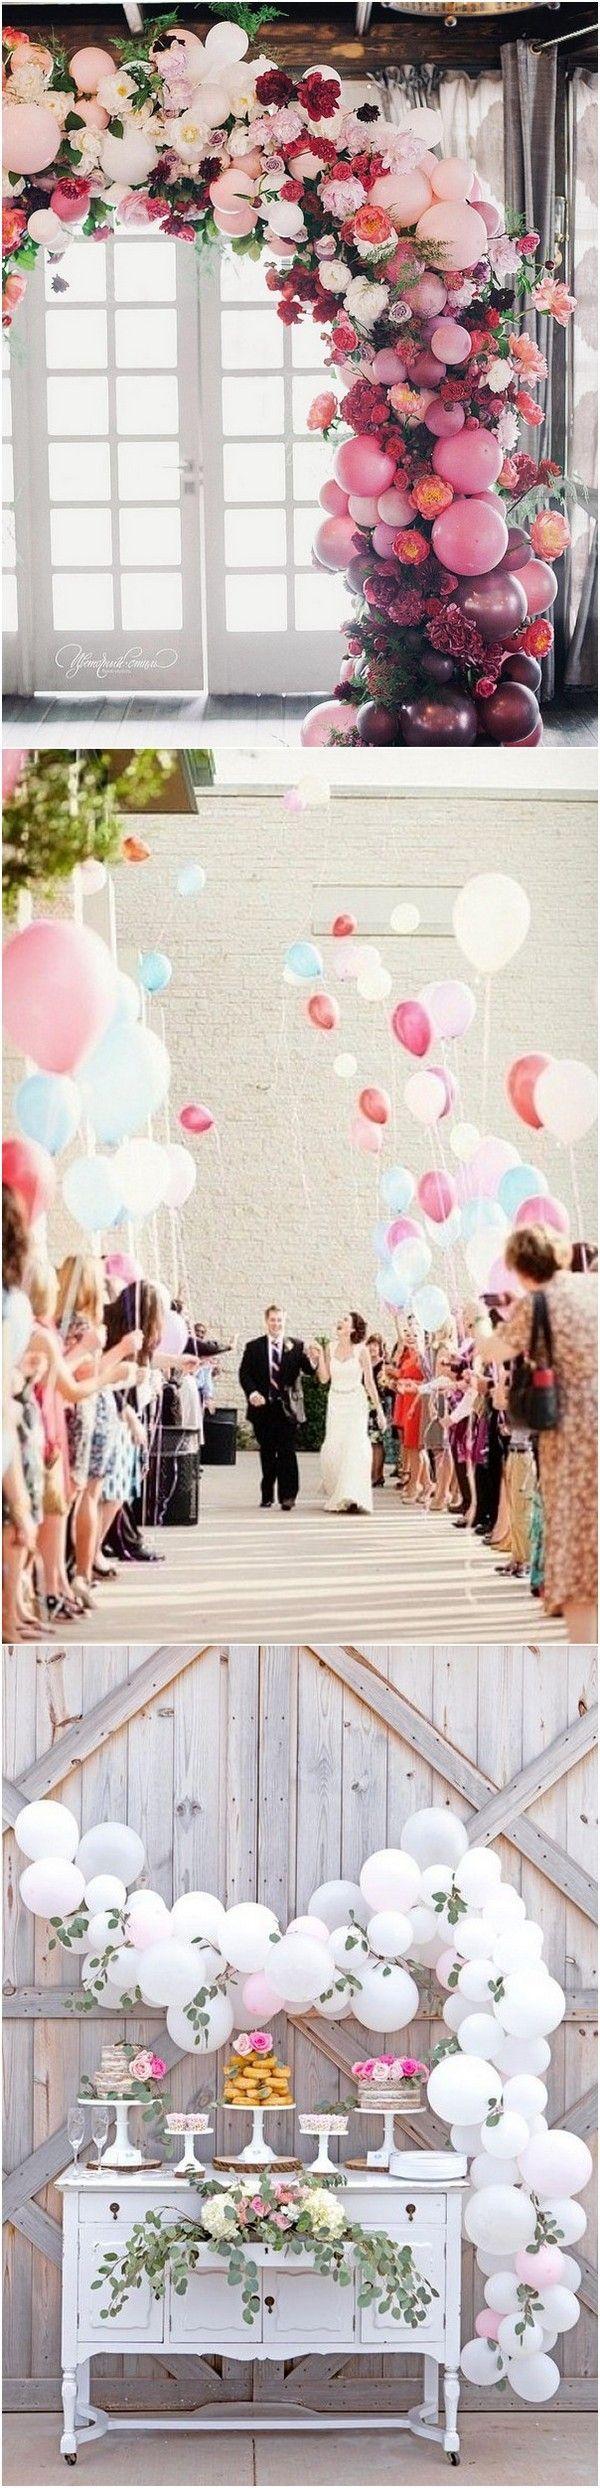 Romantic Wedding Decoration Ideas with Balloons  Dessert table